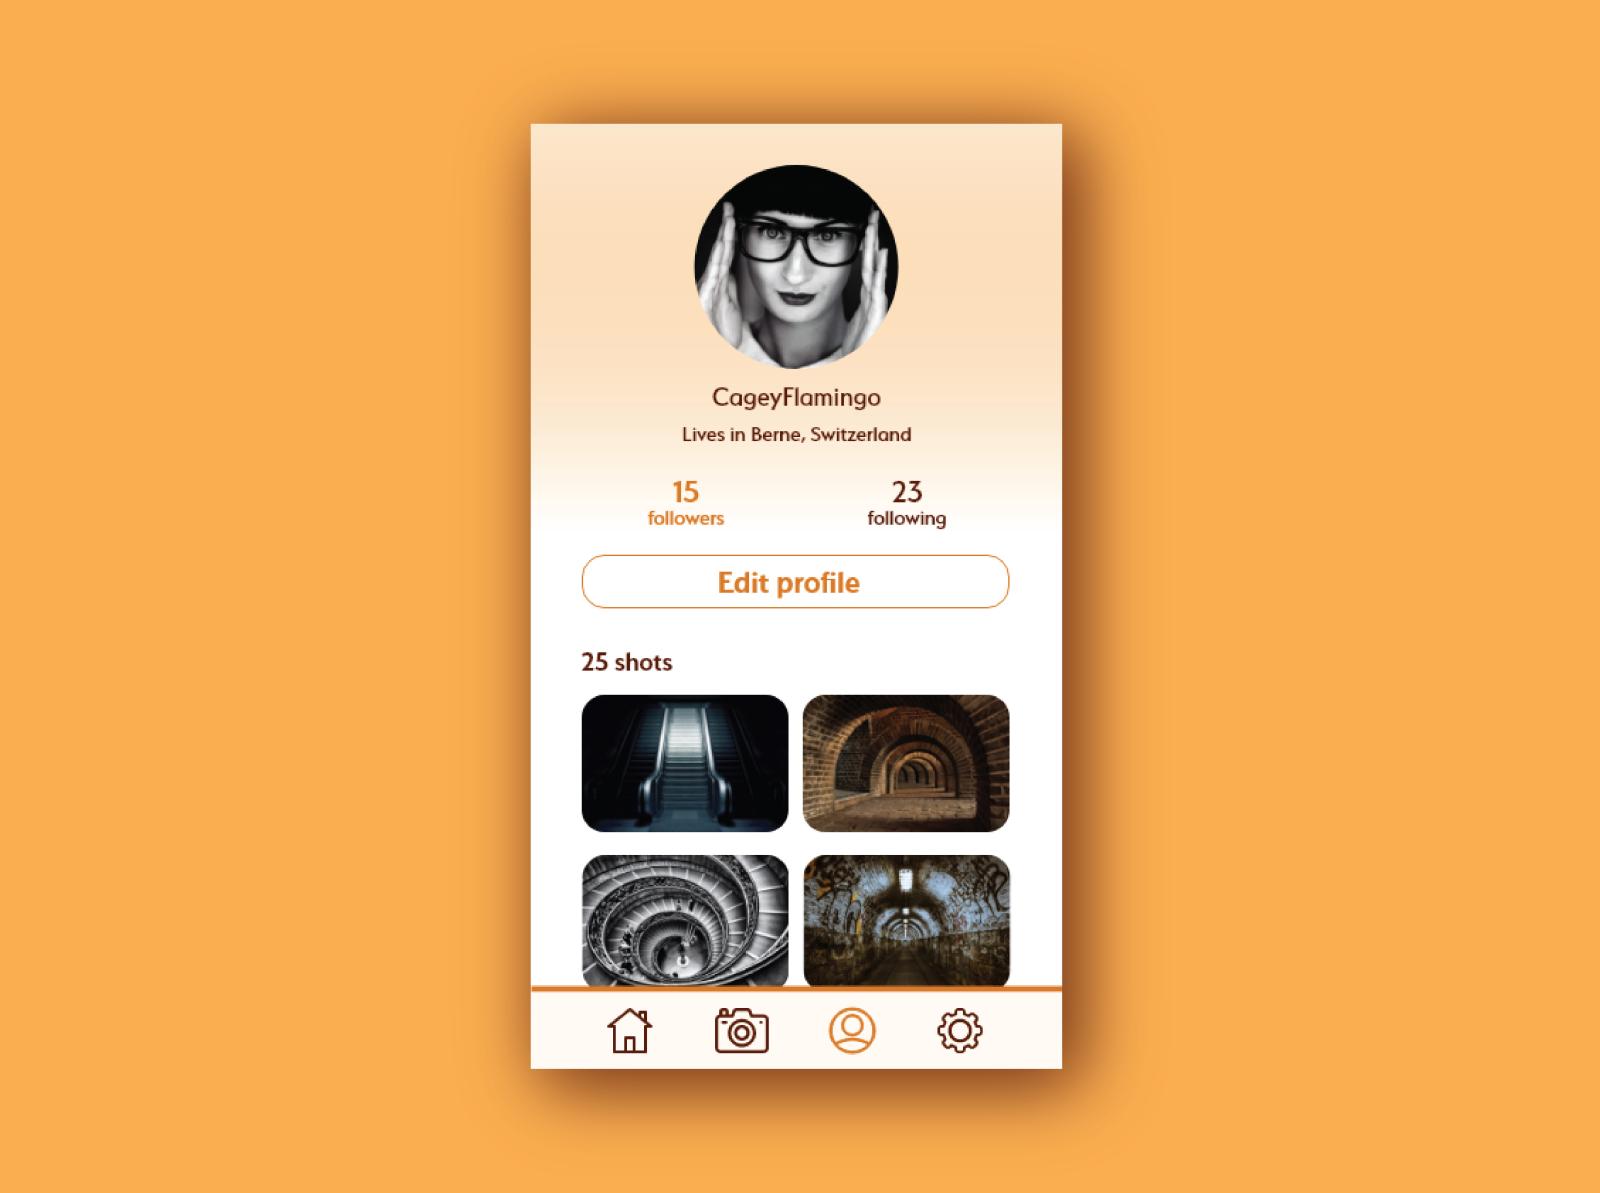 Design challenge - User profile